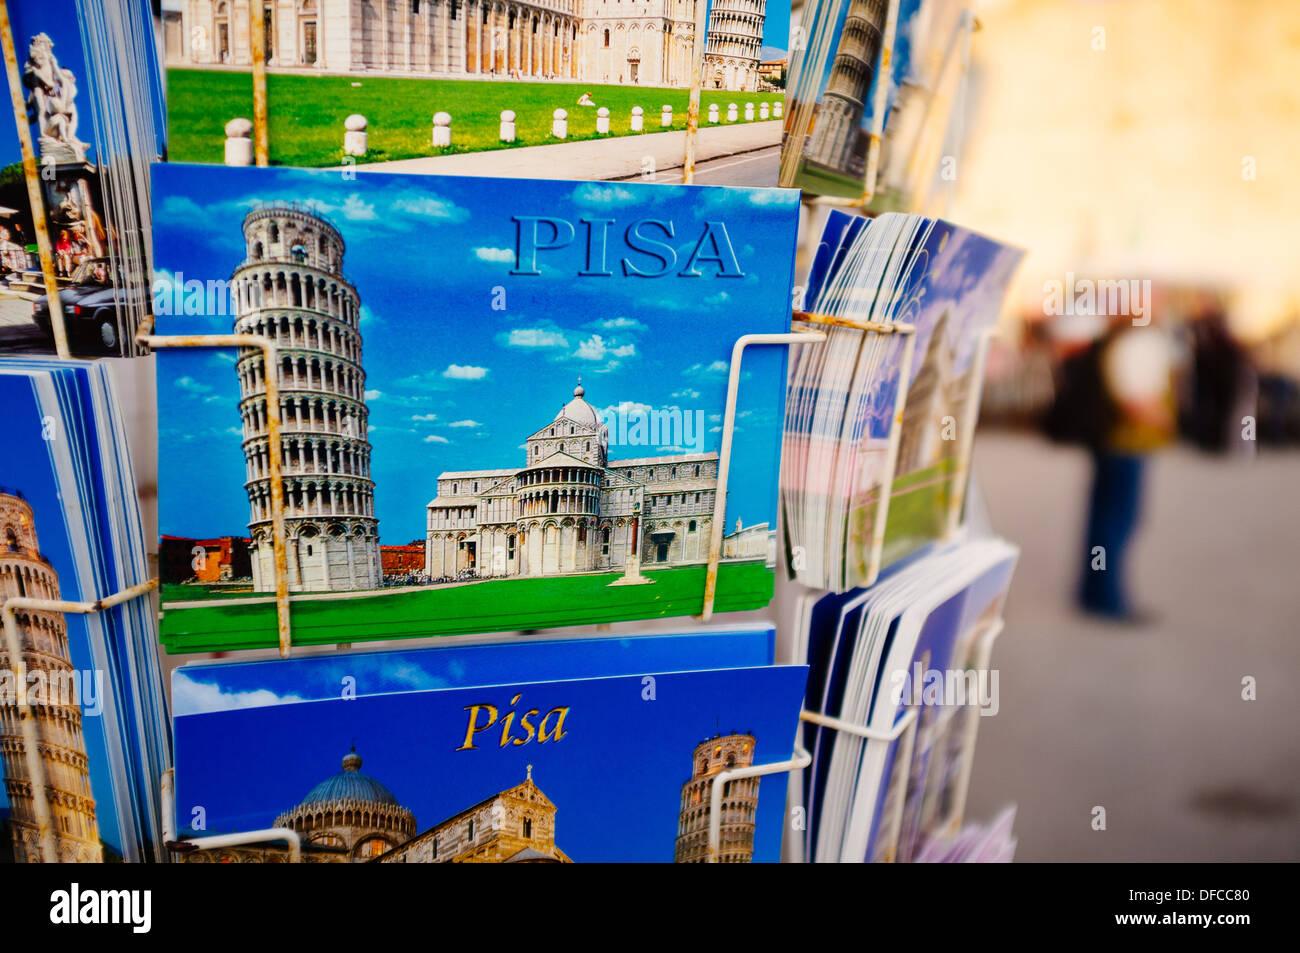 Postcards of Pisa - Pisa, Italy - Stock Image